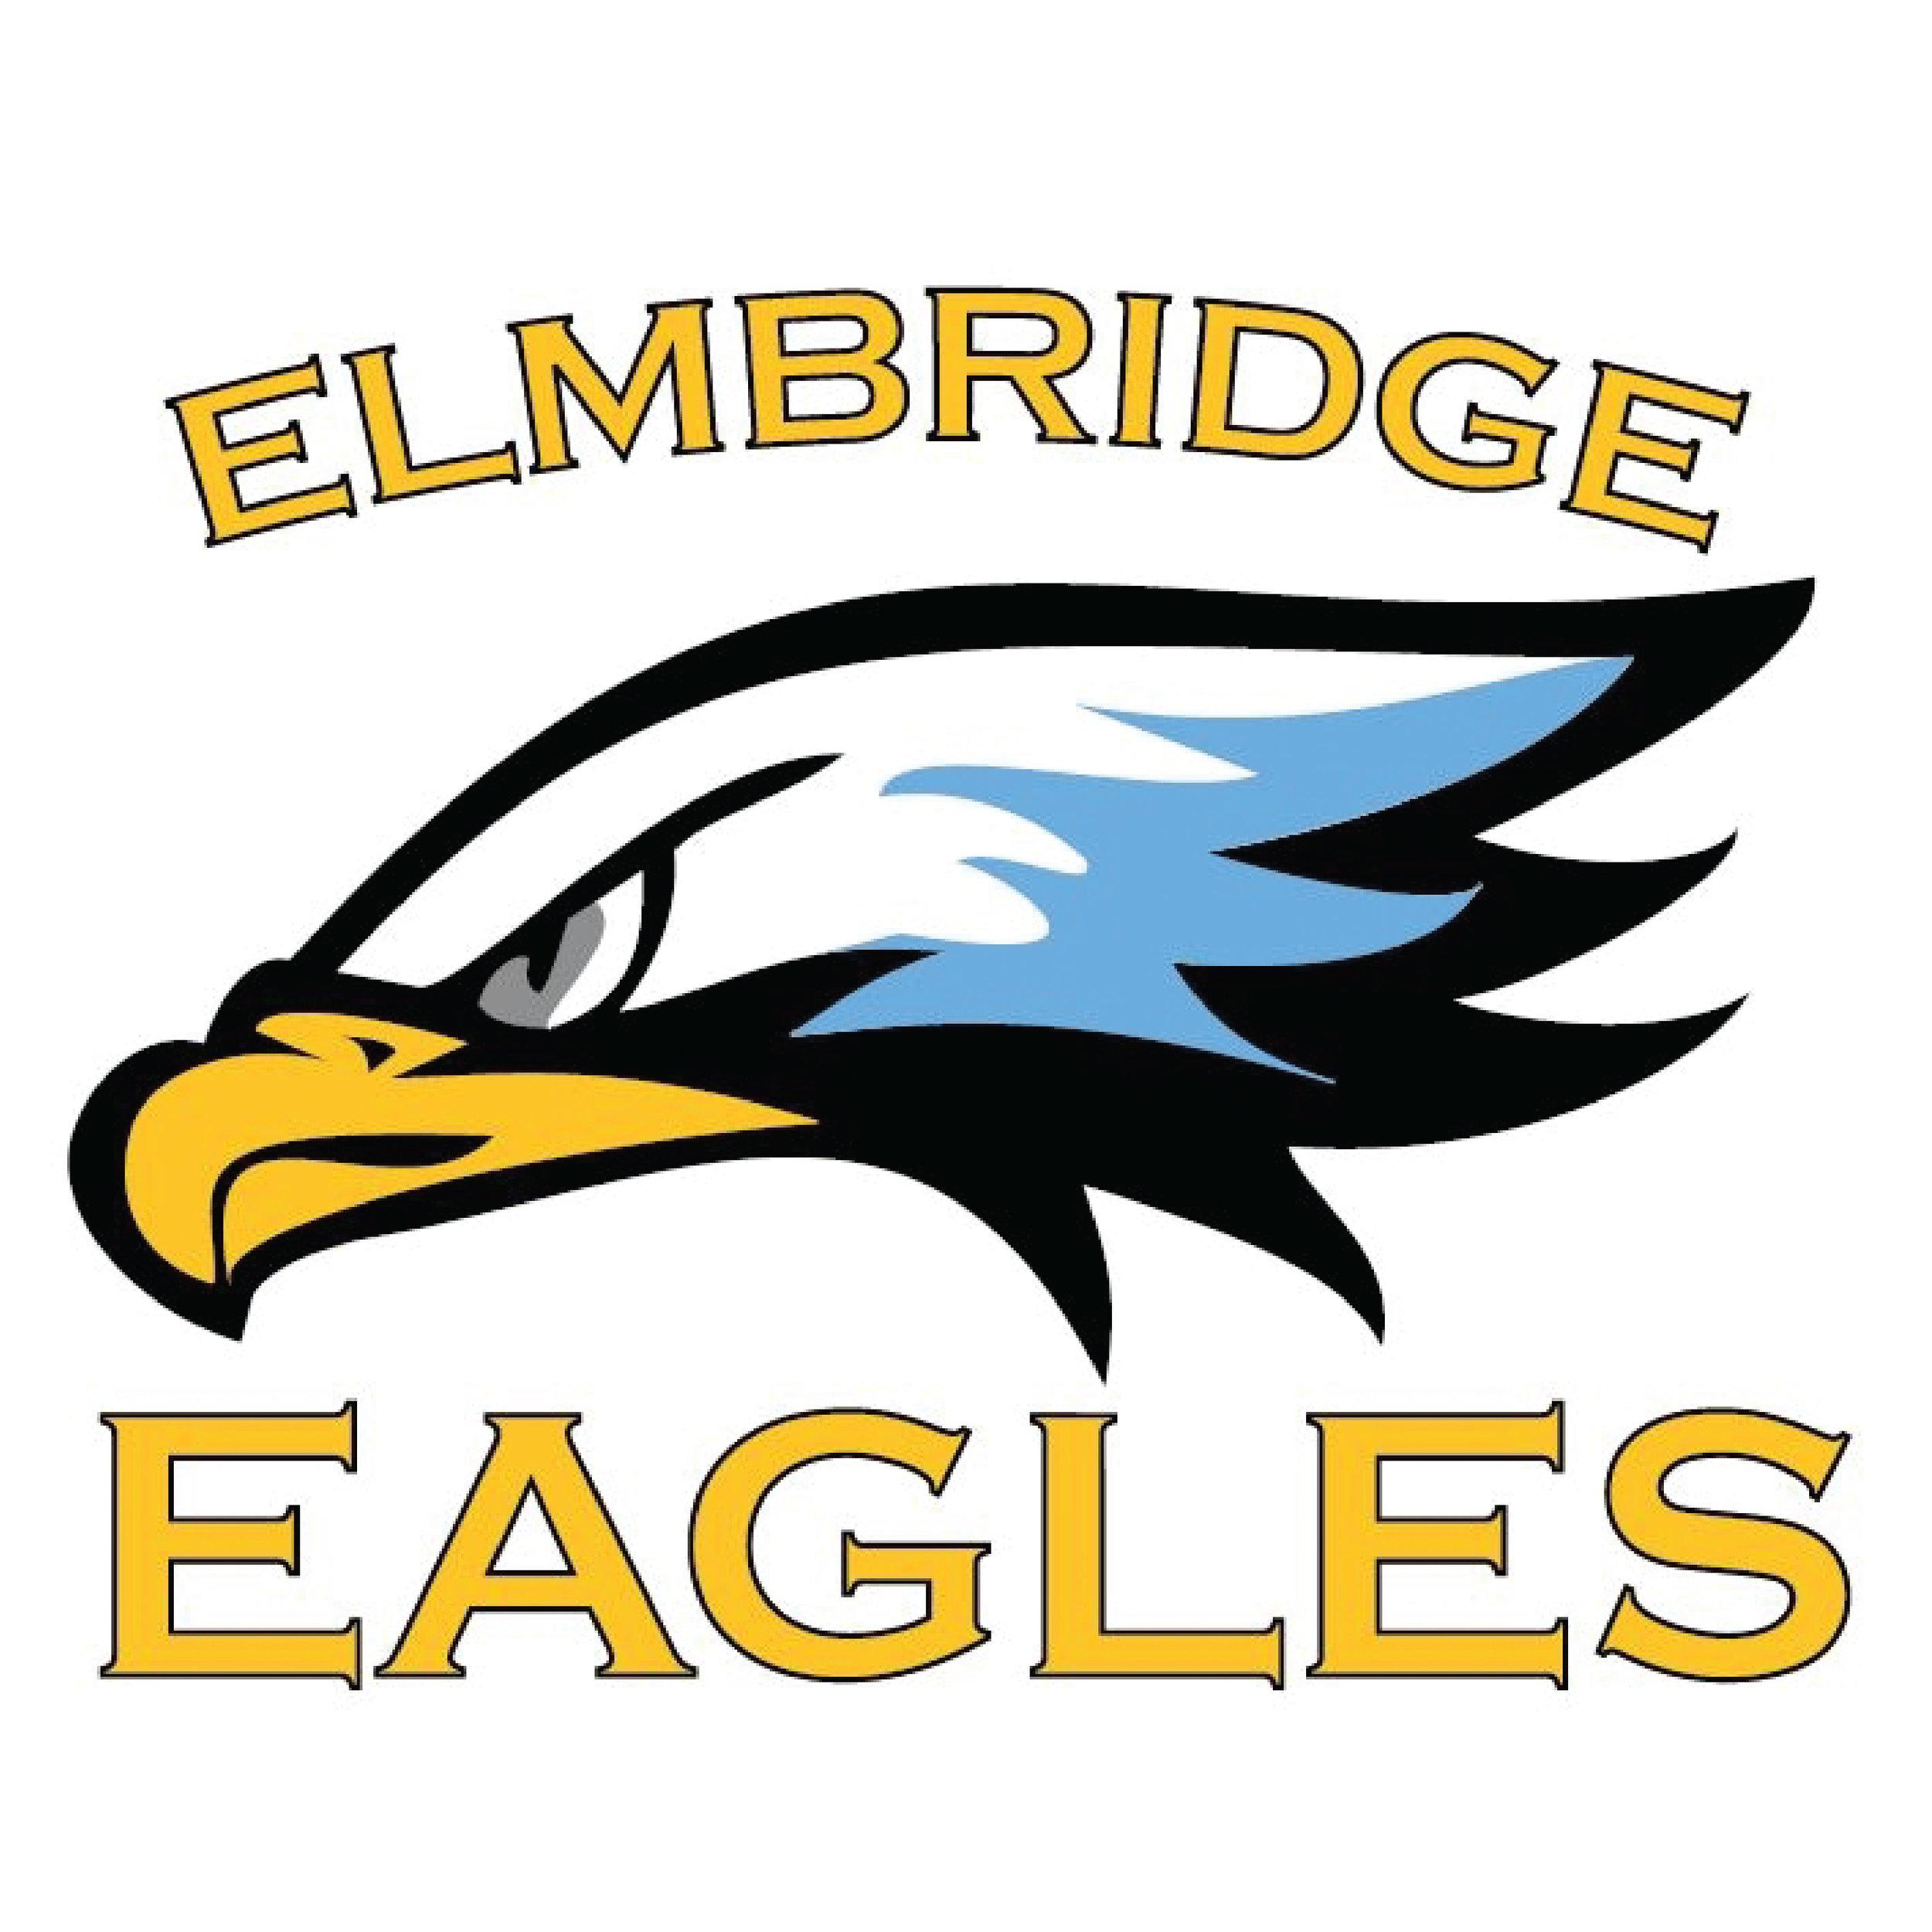 7. ELMBRIDGE EAGLES